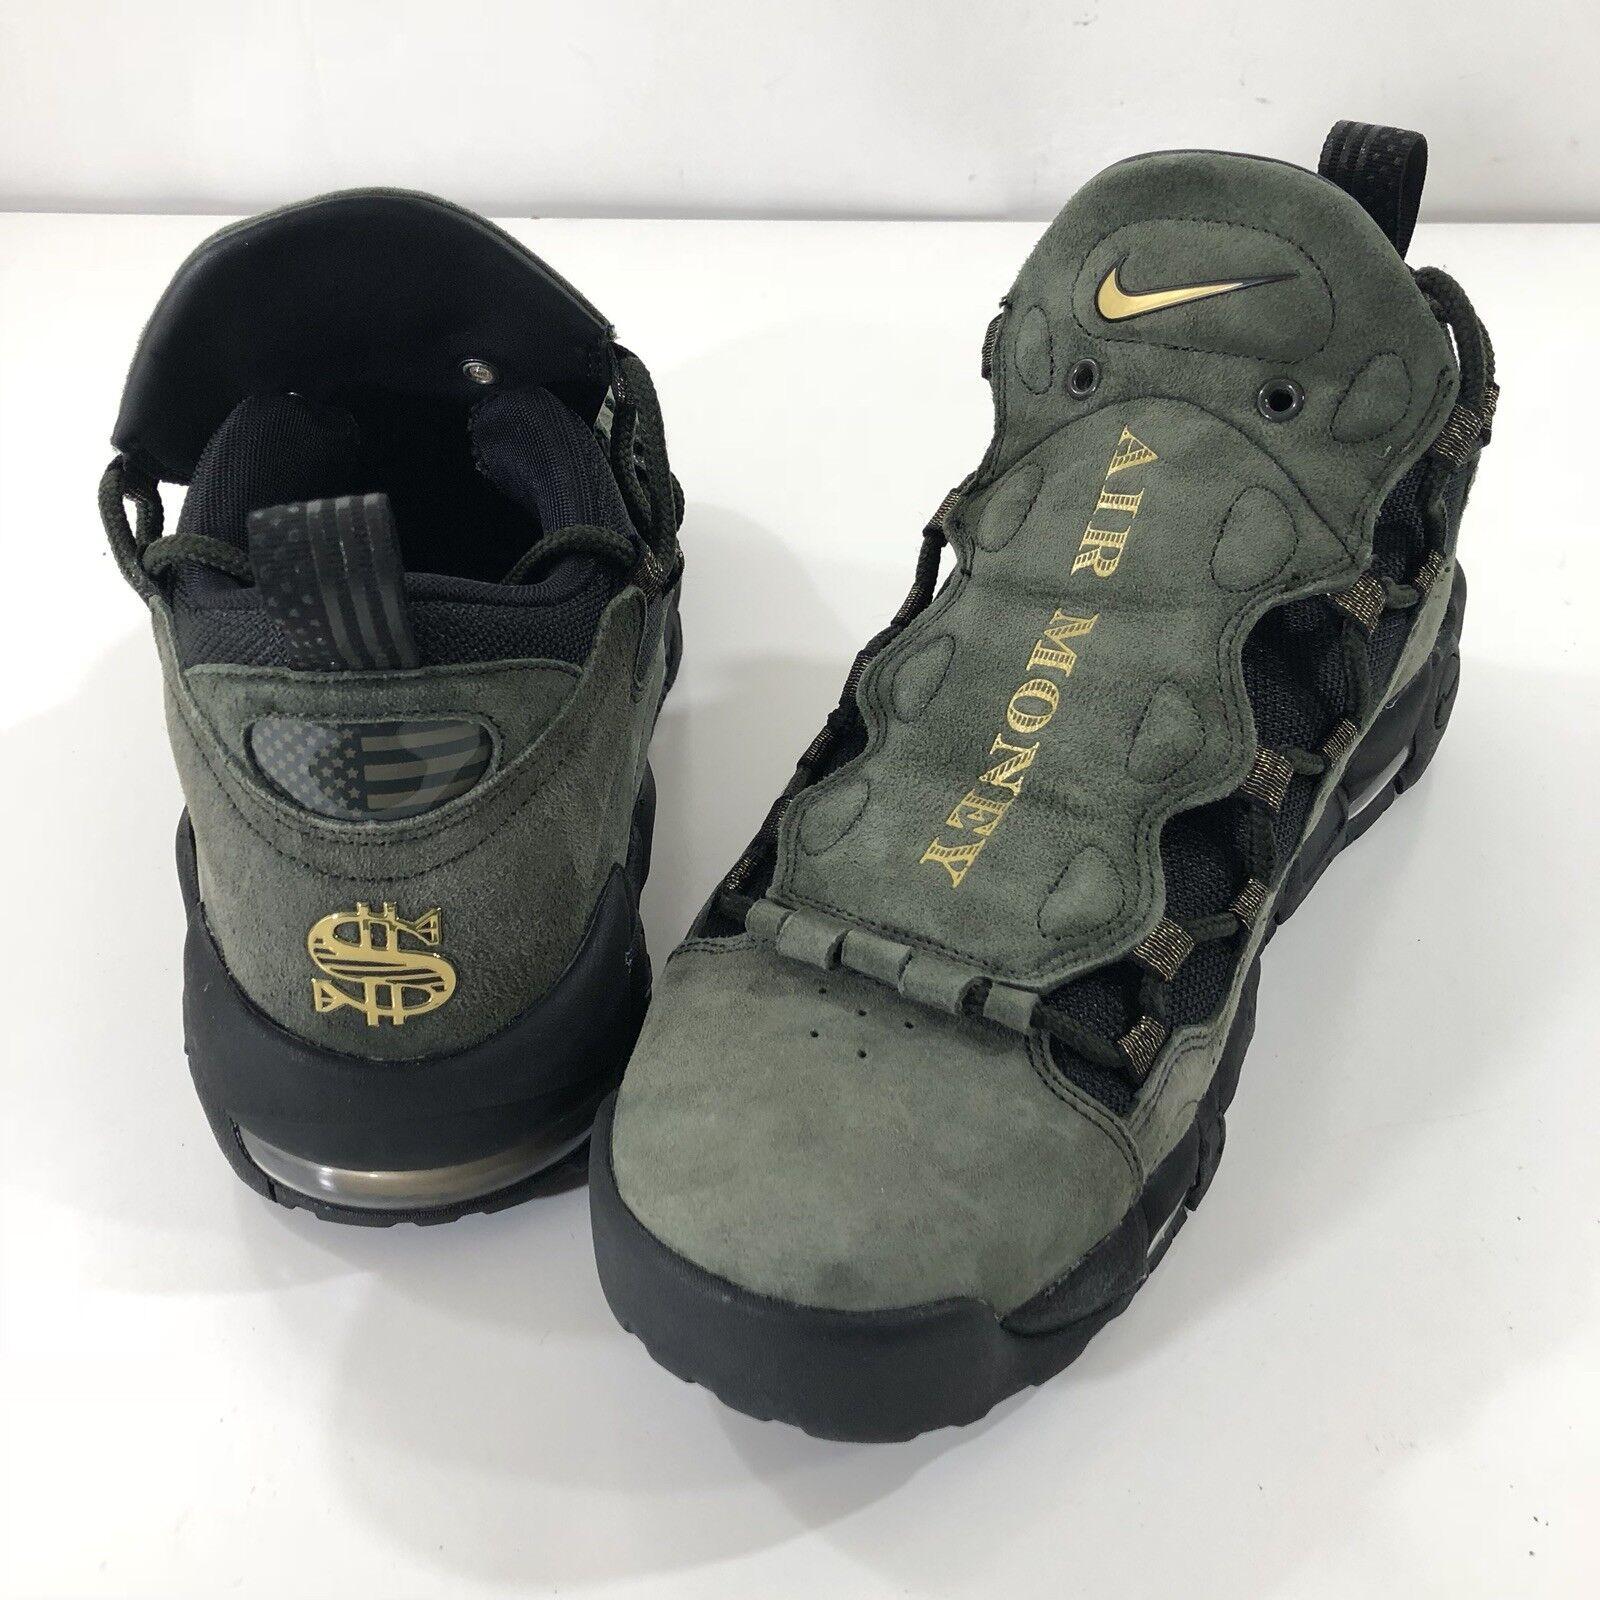 Nike Mens Air More Money QS shoes Currency Dollar Green Black AJ7383-300 SZ 10.5